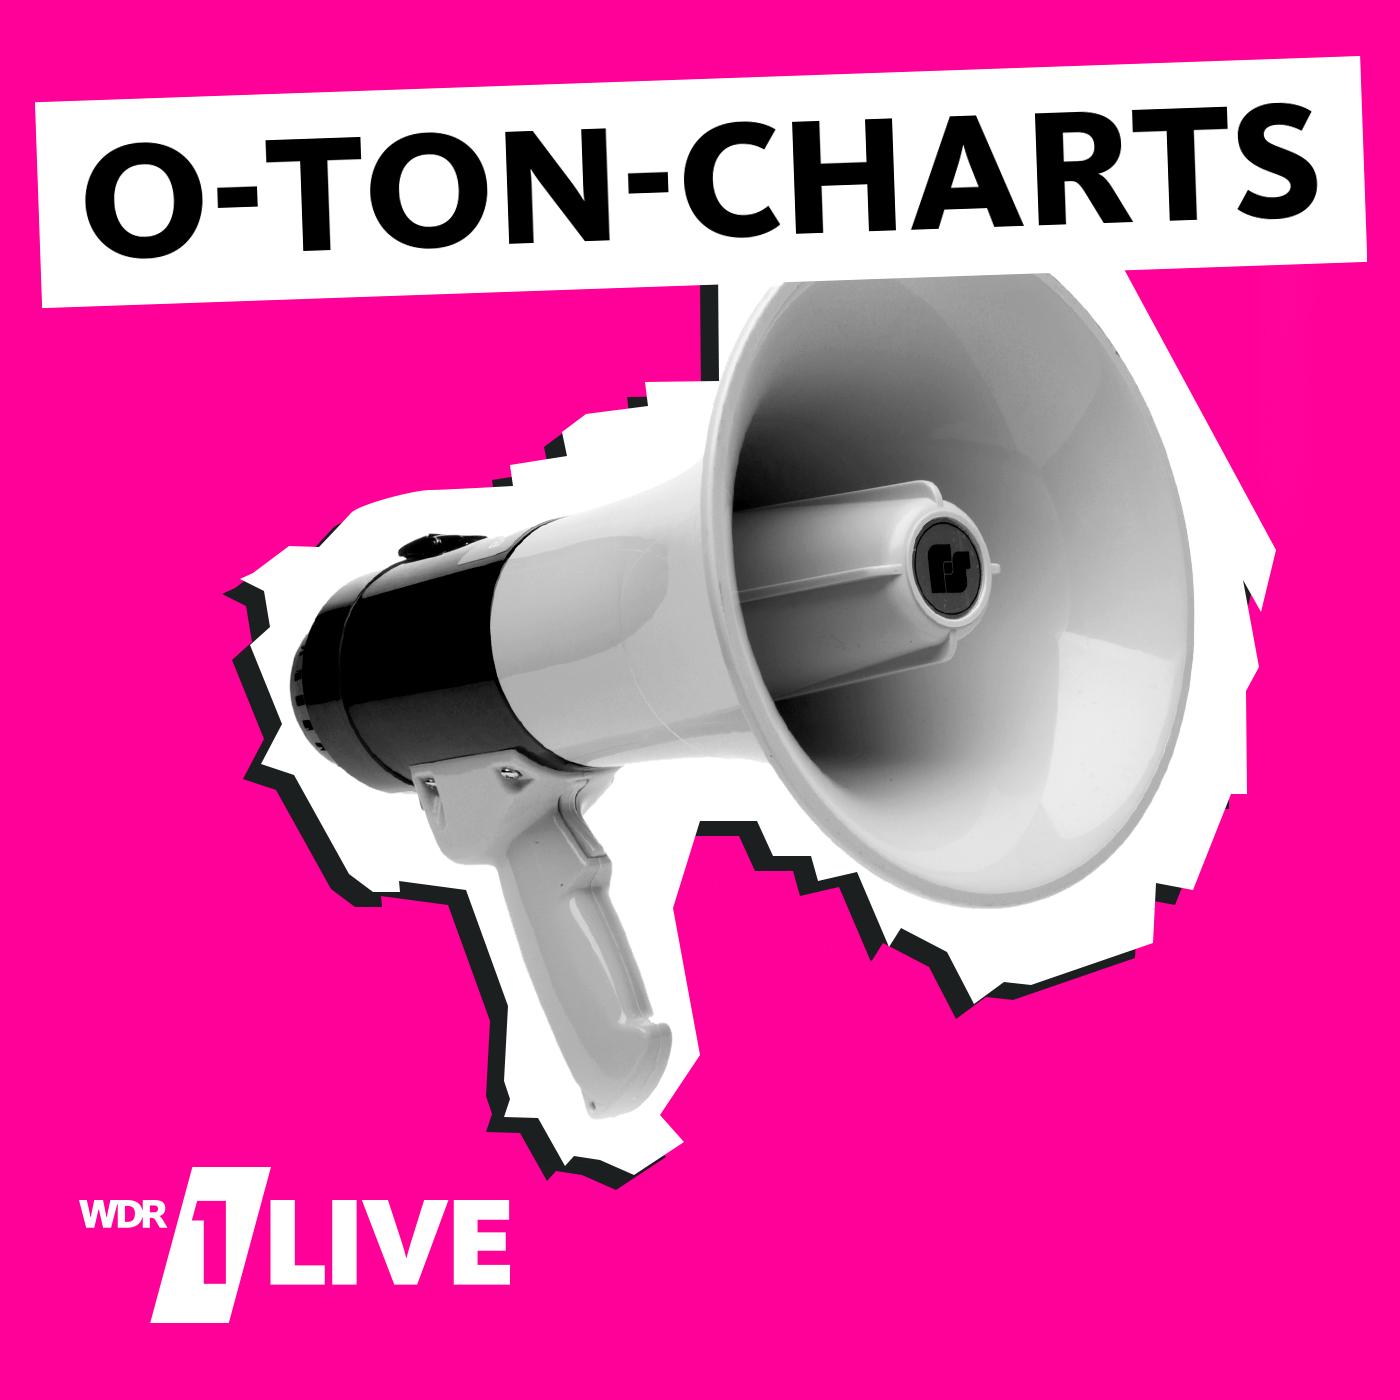 Radio hamburg charts platz 1